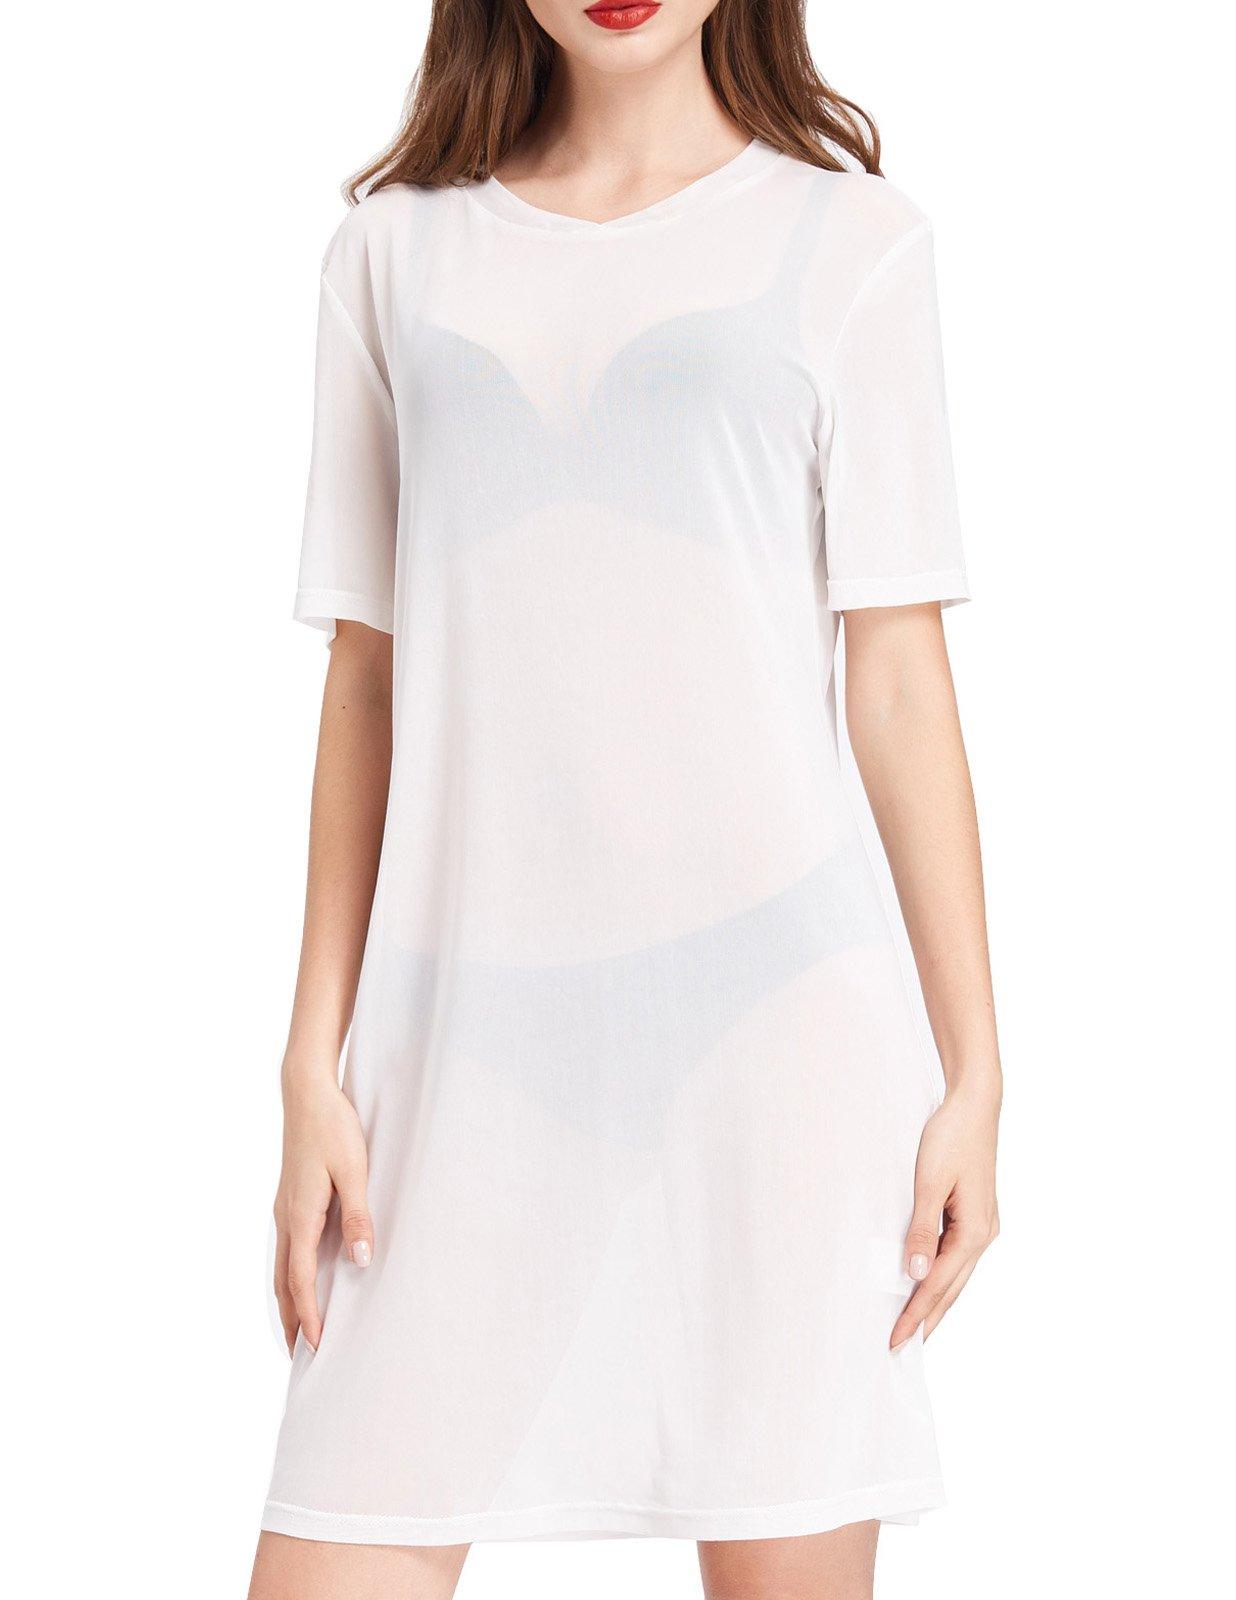 Kate Kasin See Through Pure Mesh Slim Shirts T-Shirt Dress (L,White)